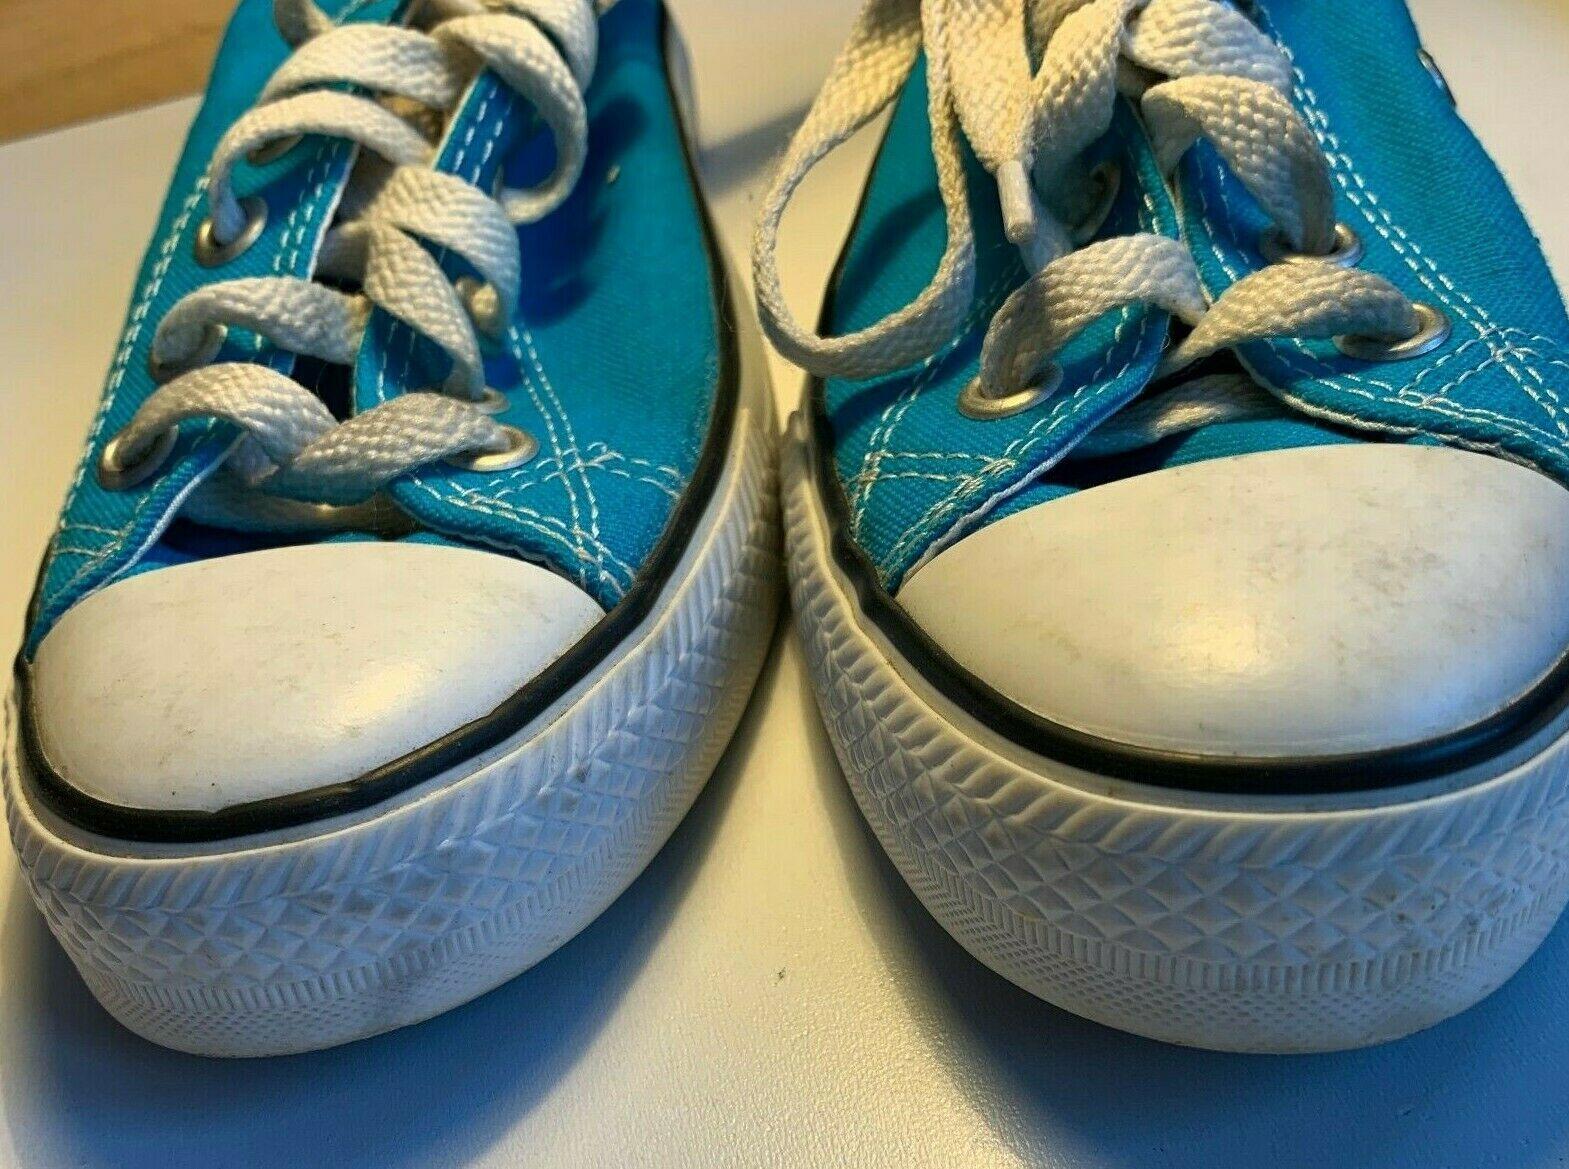 Converse EU36/UK3.5/US6 All Star Chuck Taylor Style Light Blue